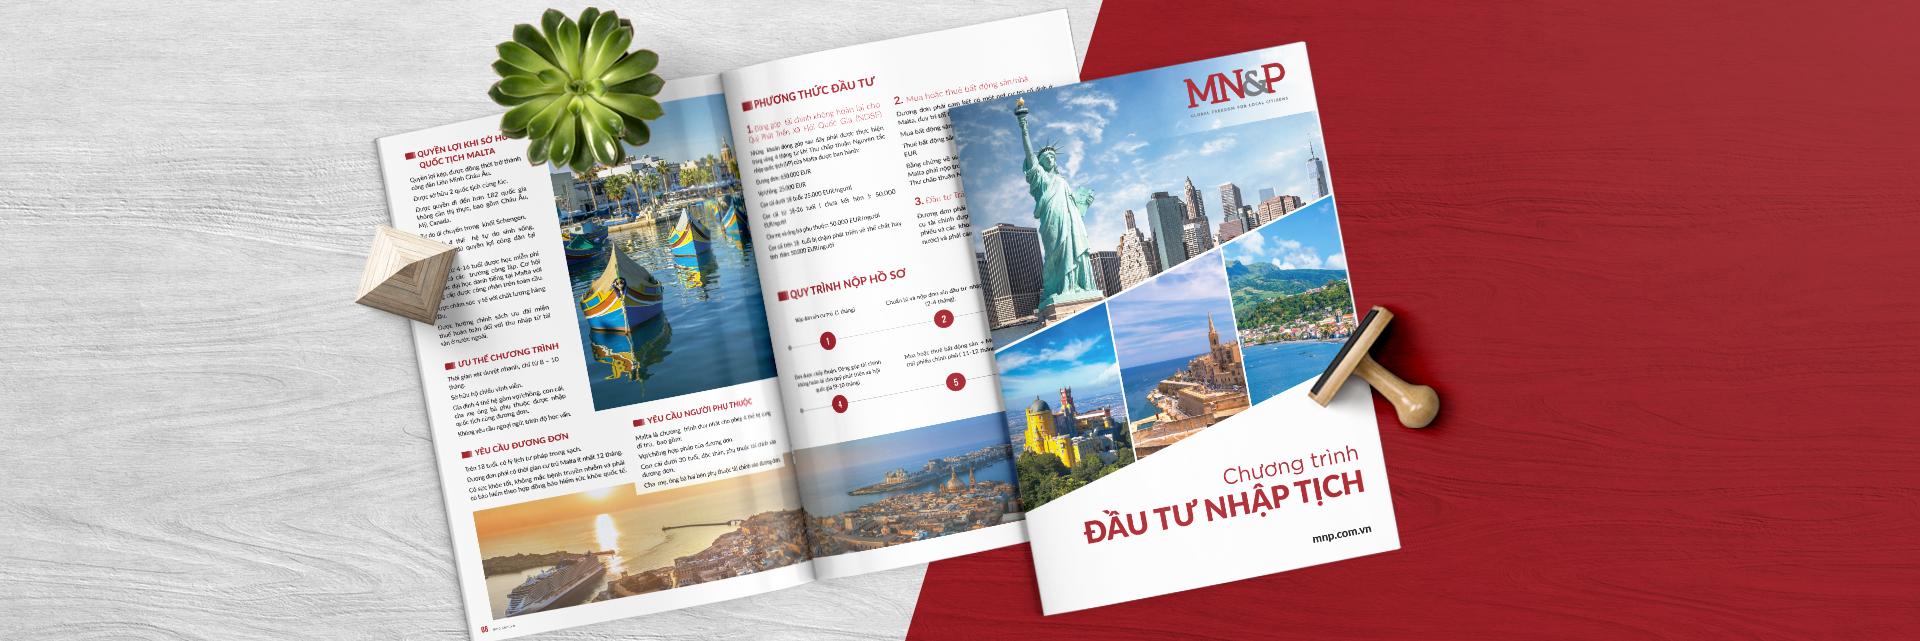 thiet_ke_in_brochure_magazine_re_dep_MNP_slide1